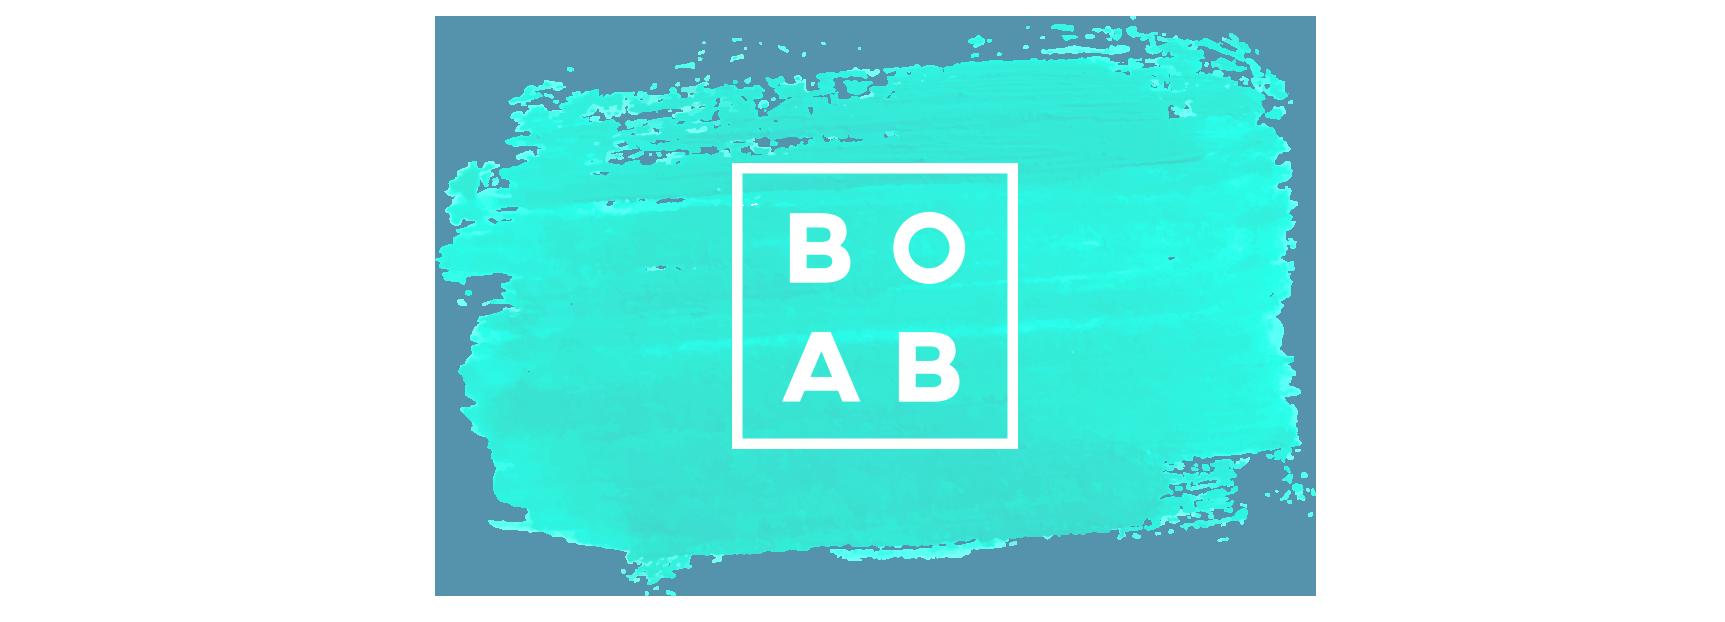 Boab Paint